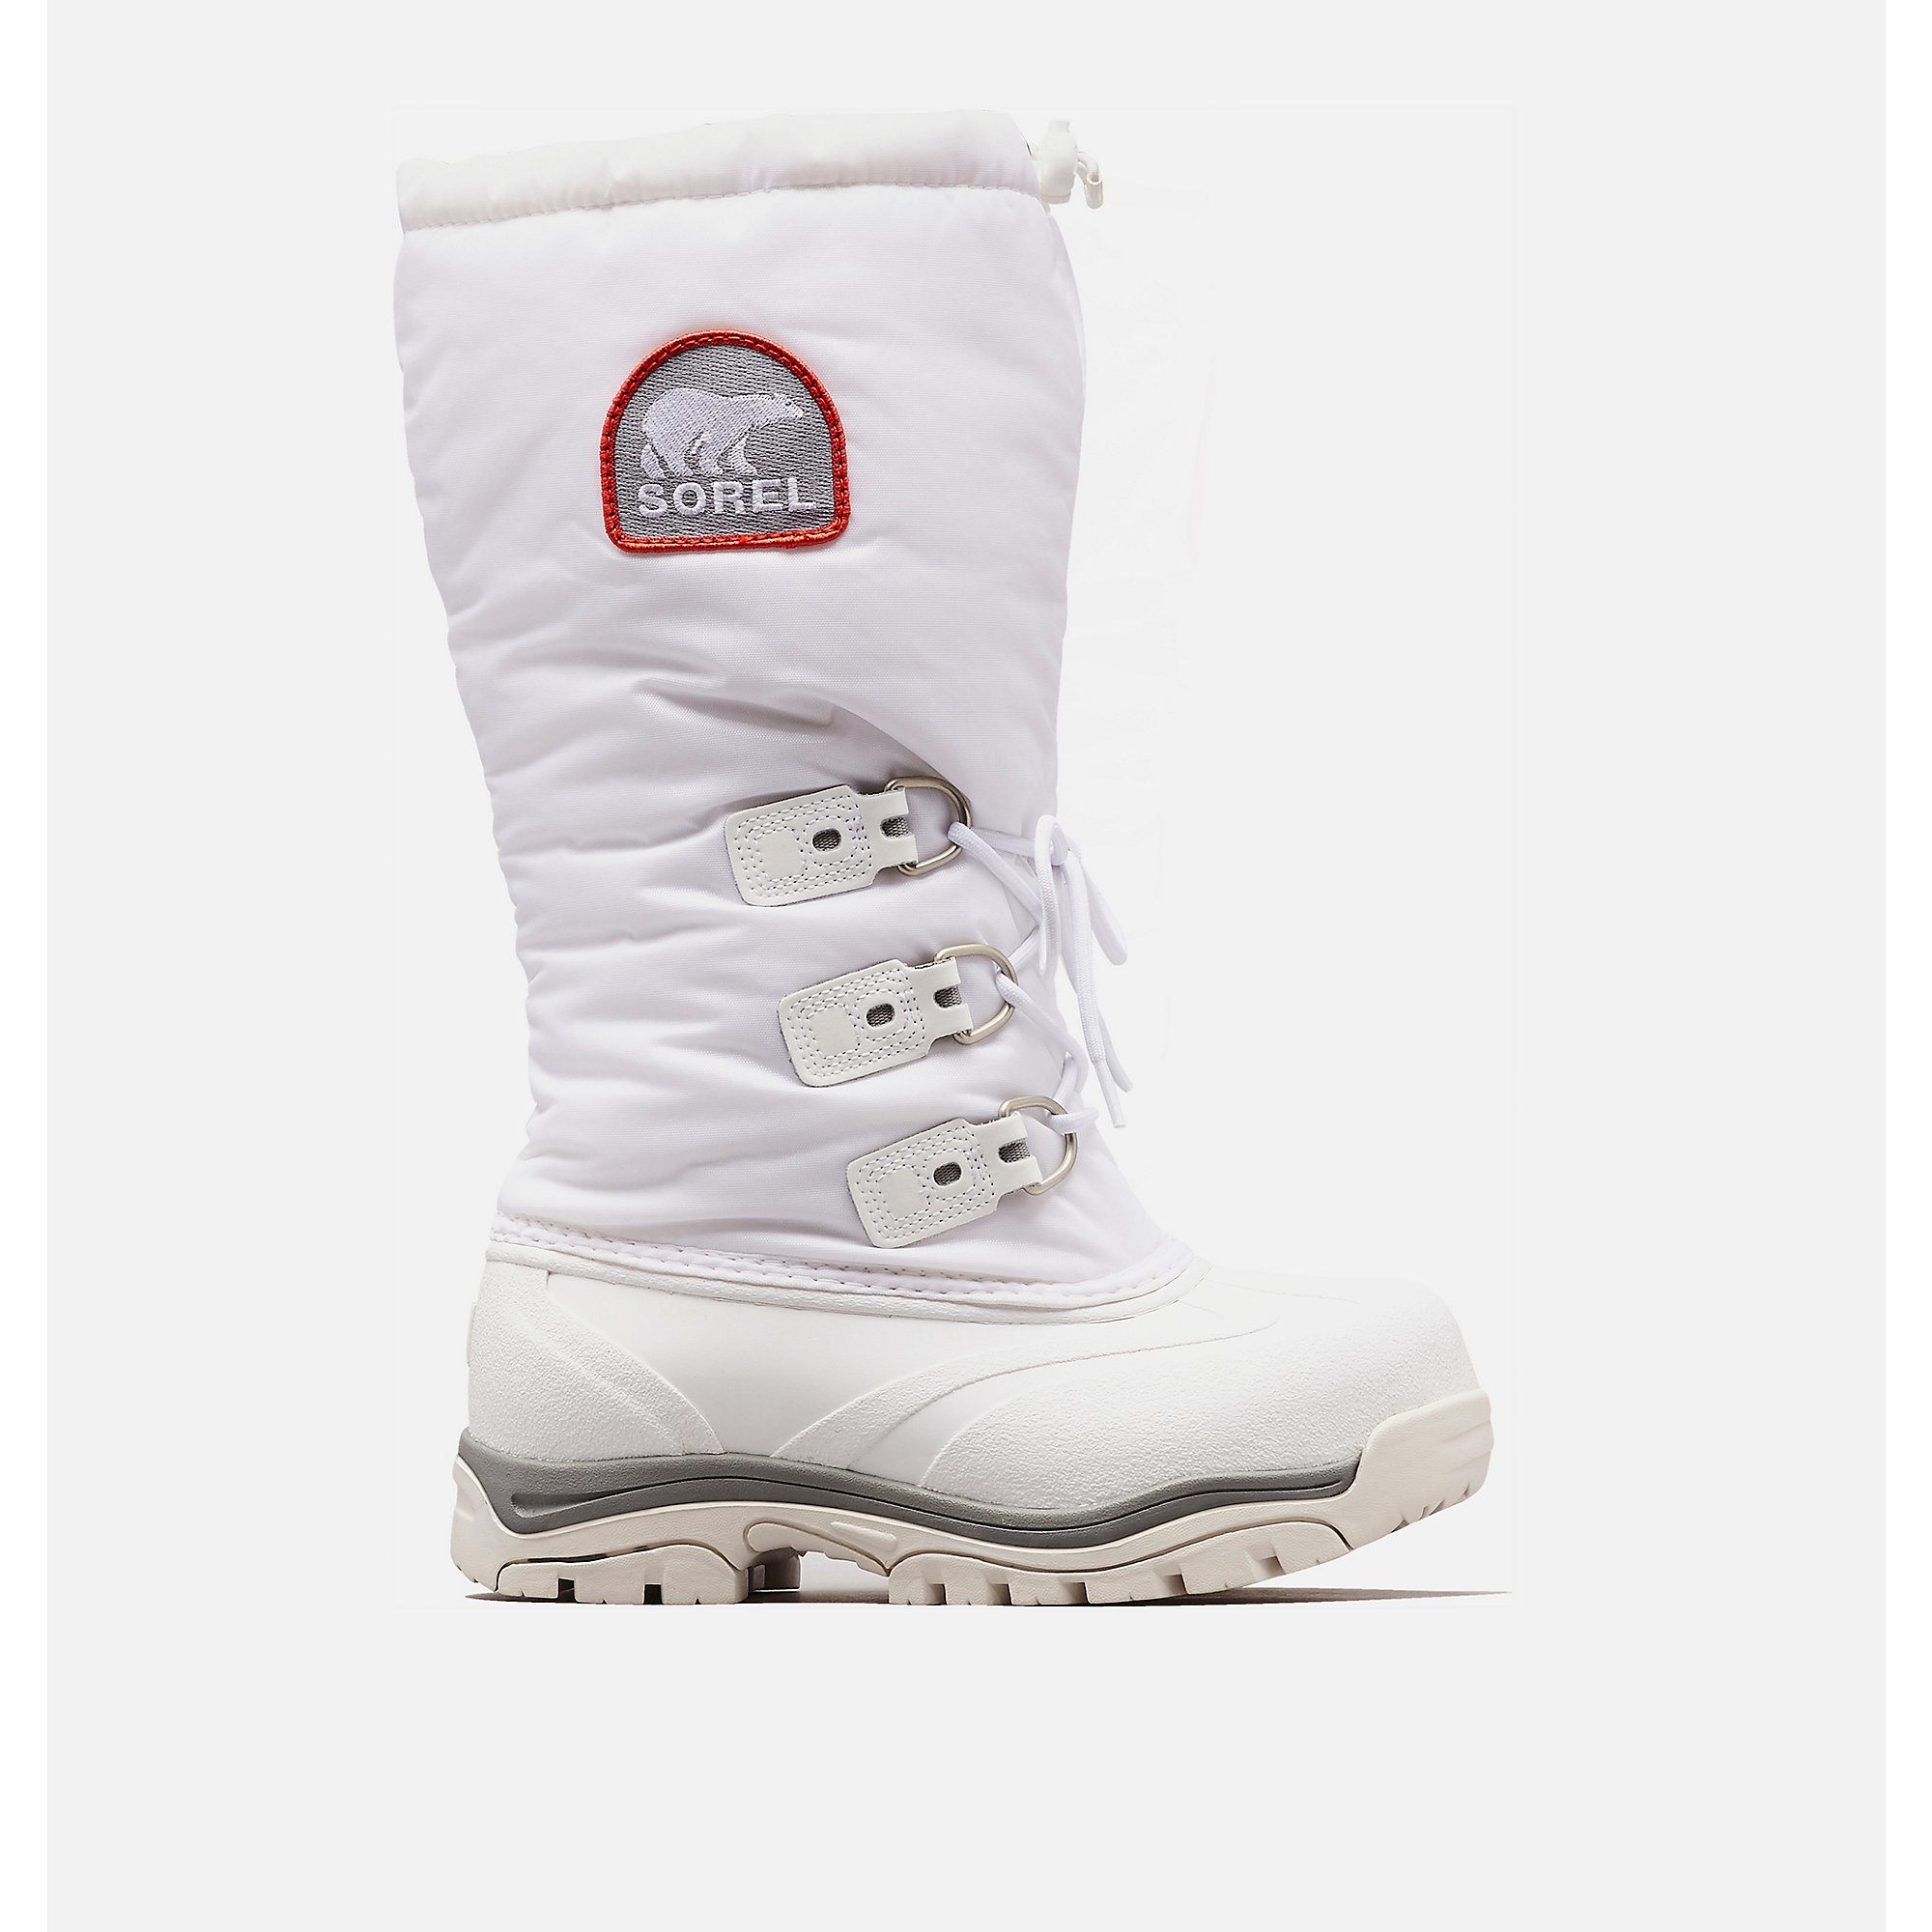 Sorel SNOWLION XT BOOTS